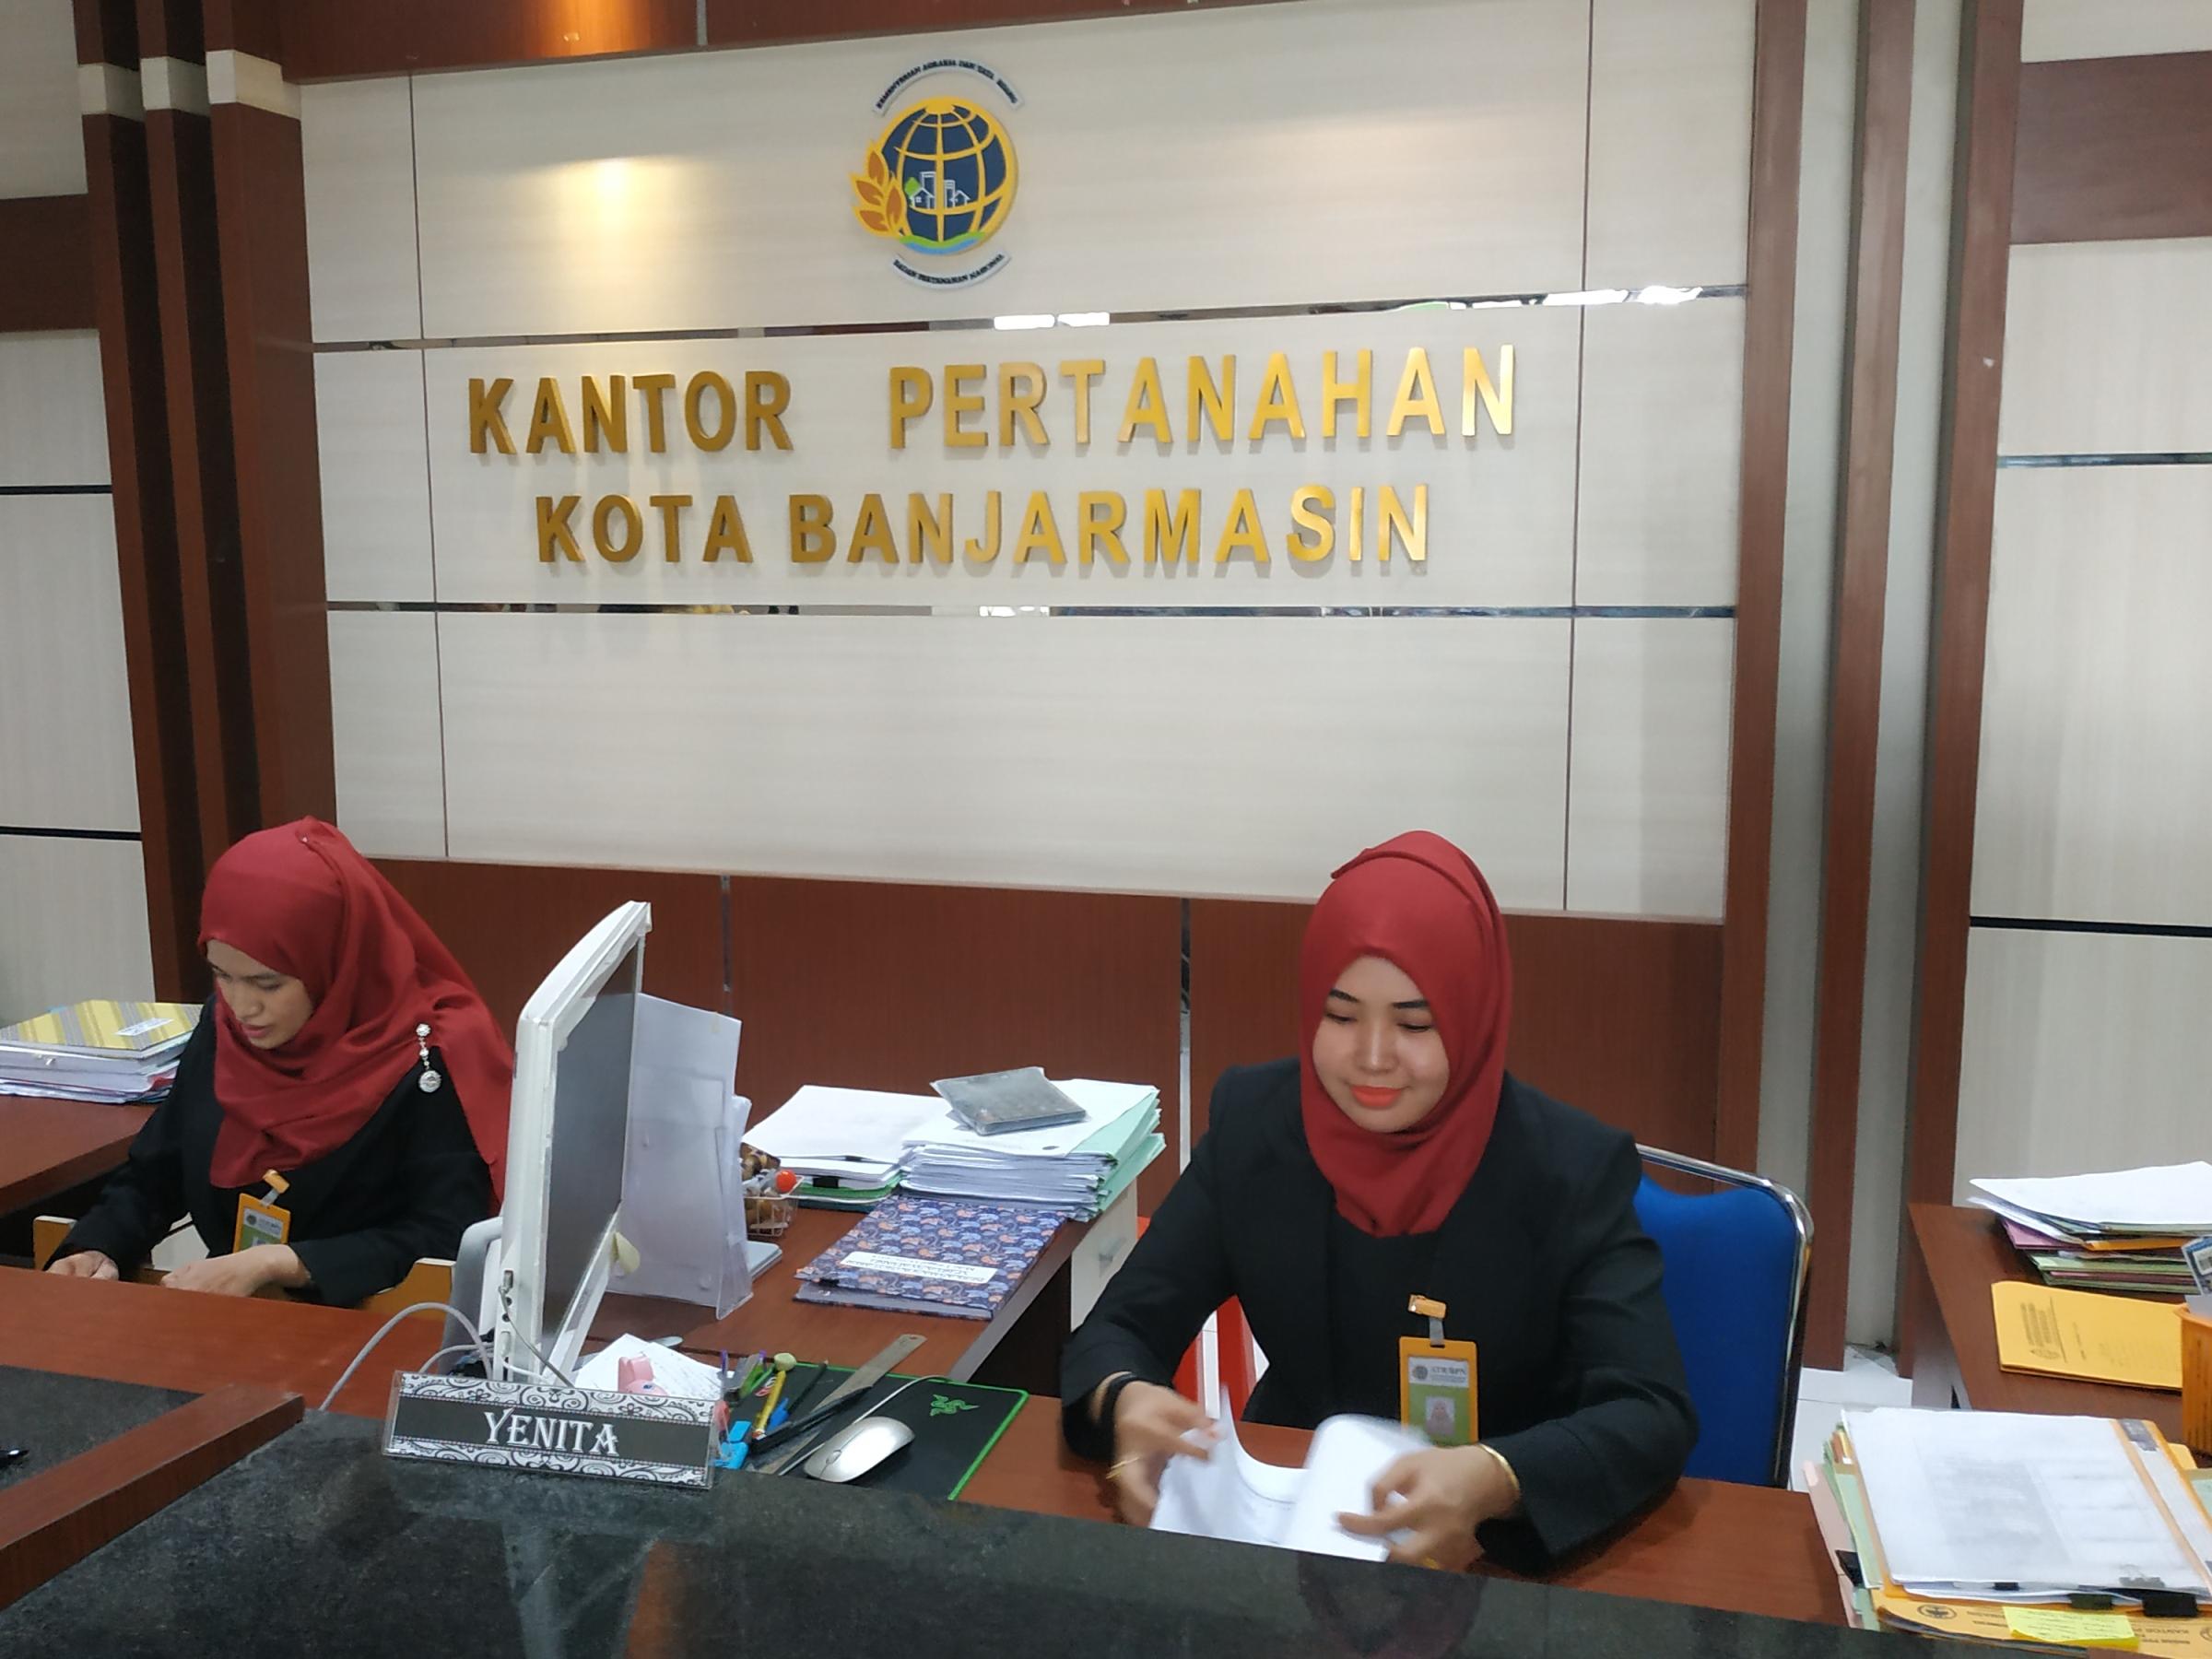 Badan-Pertanahan-Nasional-Kota-Banjarmasin-Front_Office.jpeg (2400×1800)